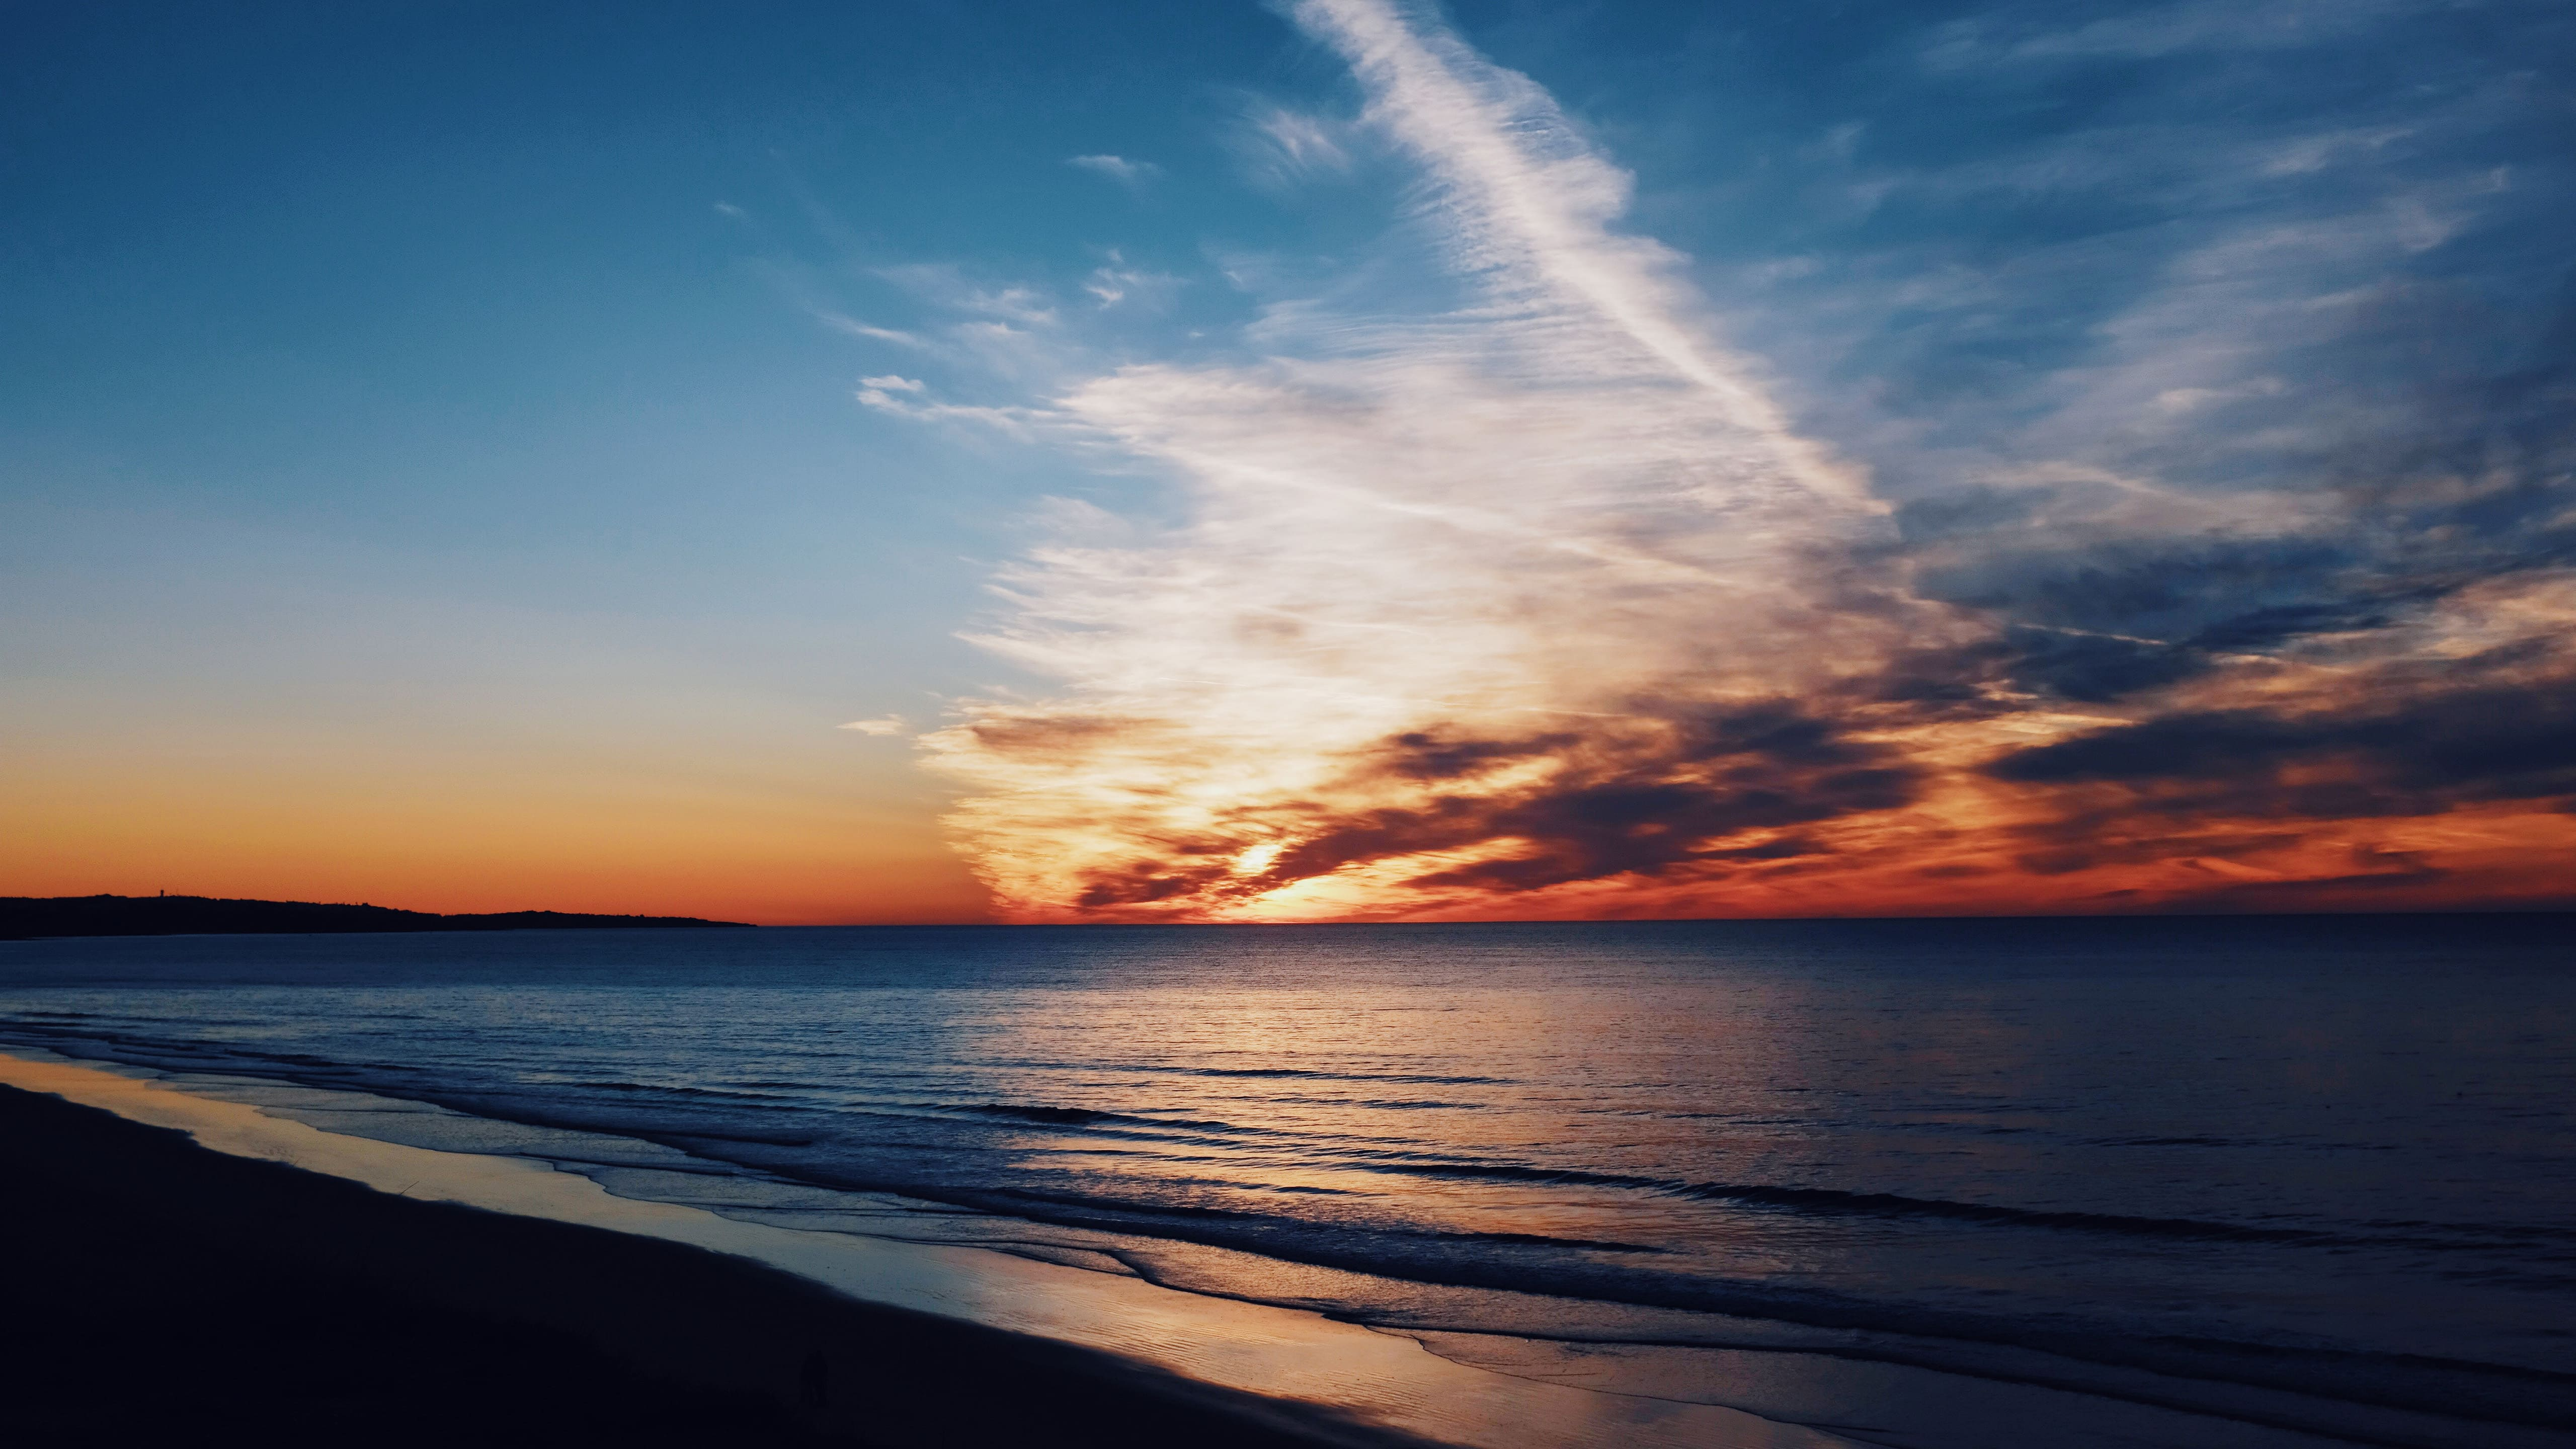 HDoboi.Kiev.ua - Обои на телефон закат на море у берега